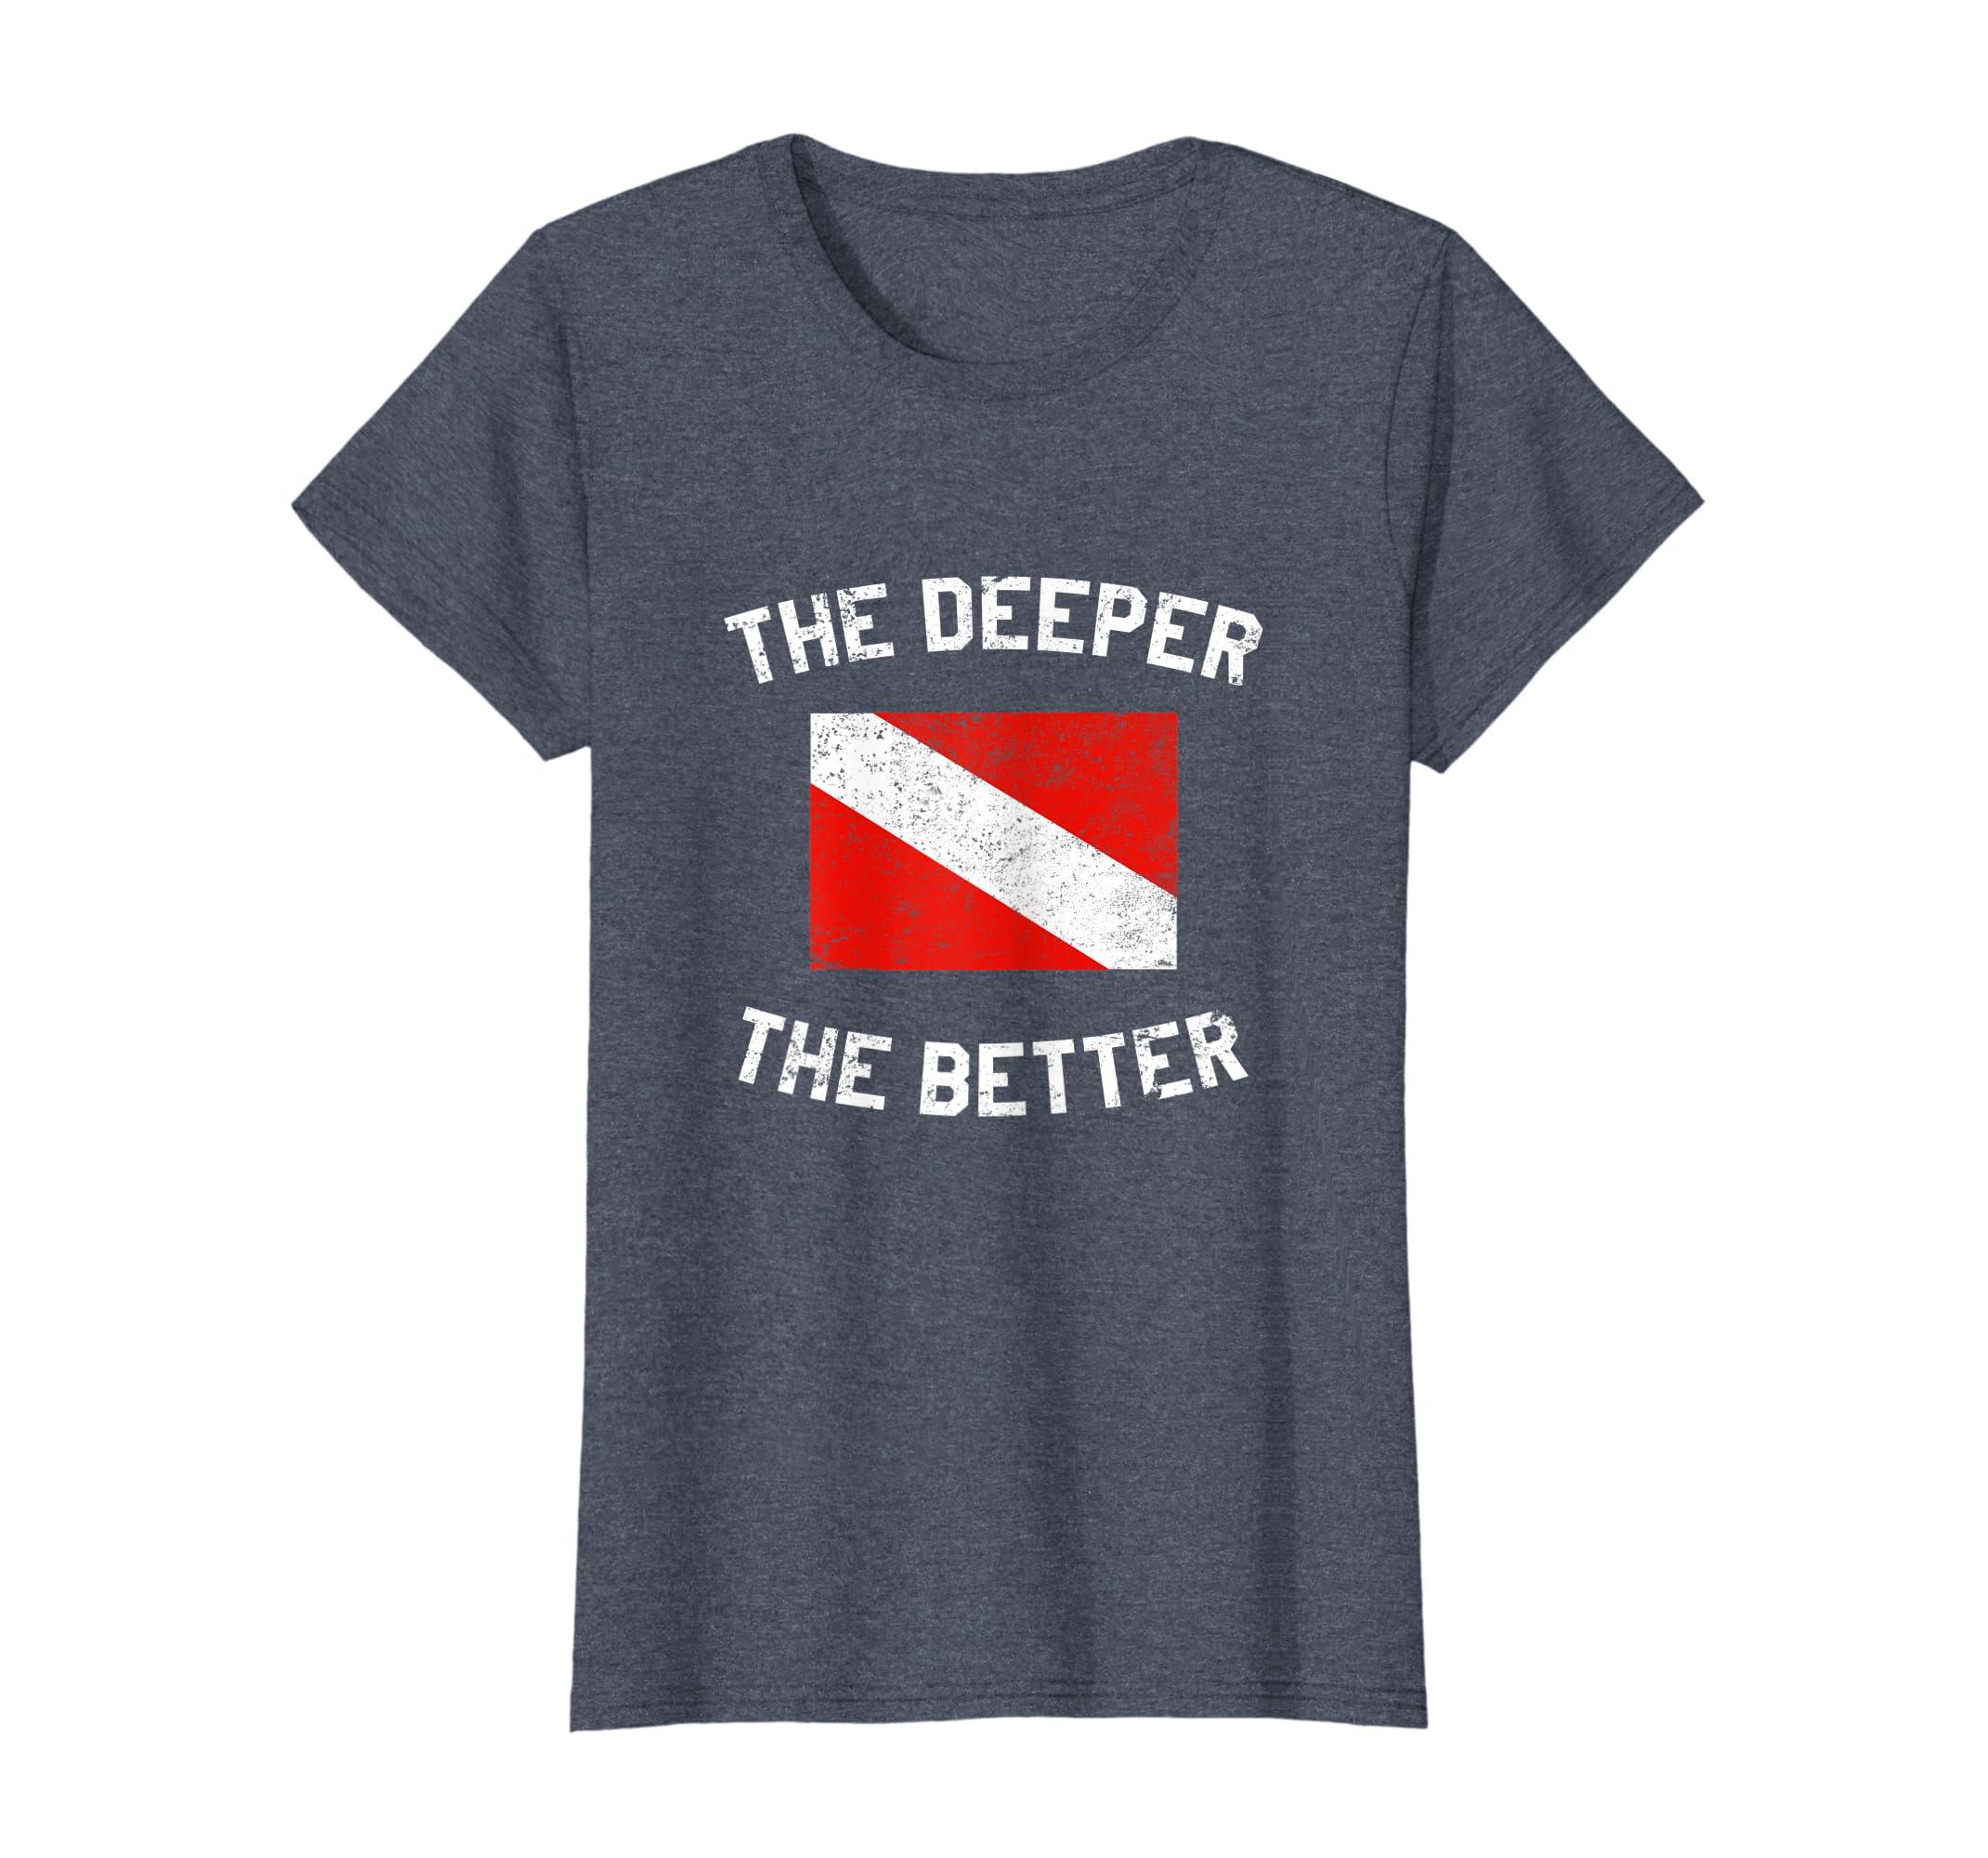 61b8d96817 Amazon.com: The Deeper The Better Funny Scuba Diving T-Shirt: Clothing